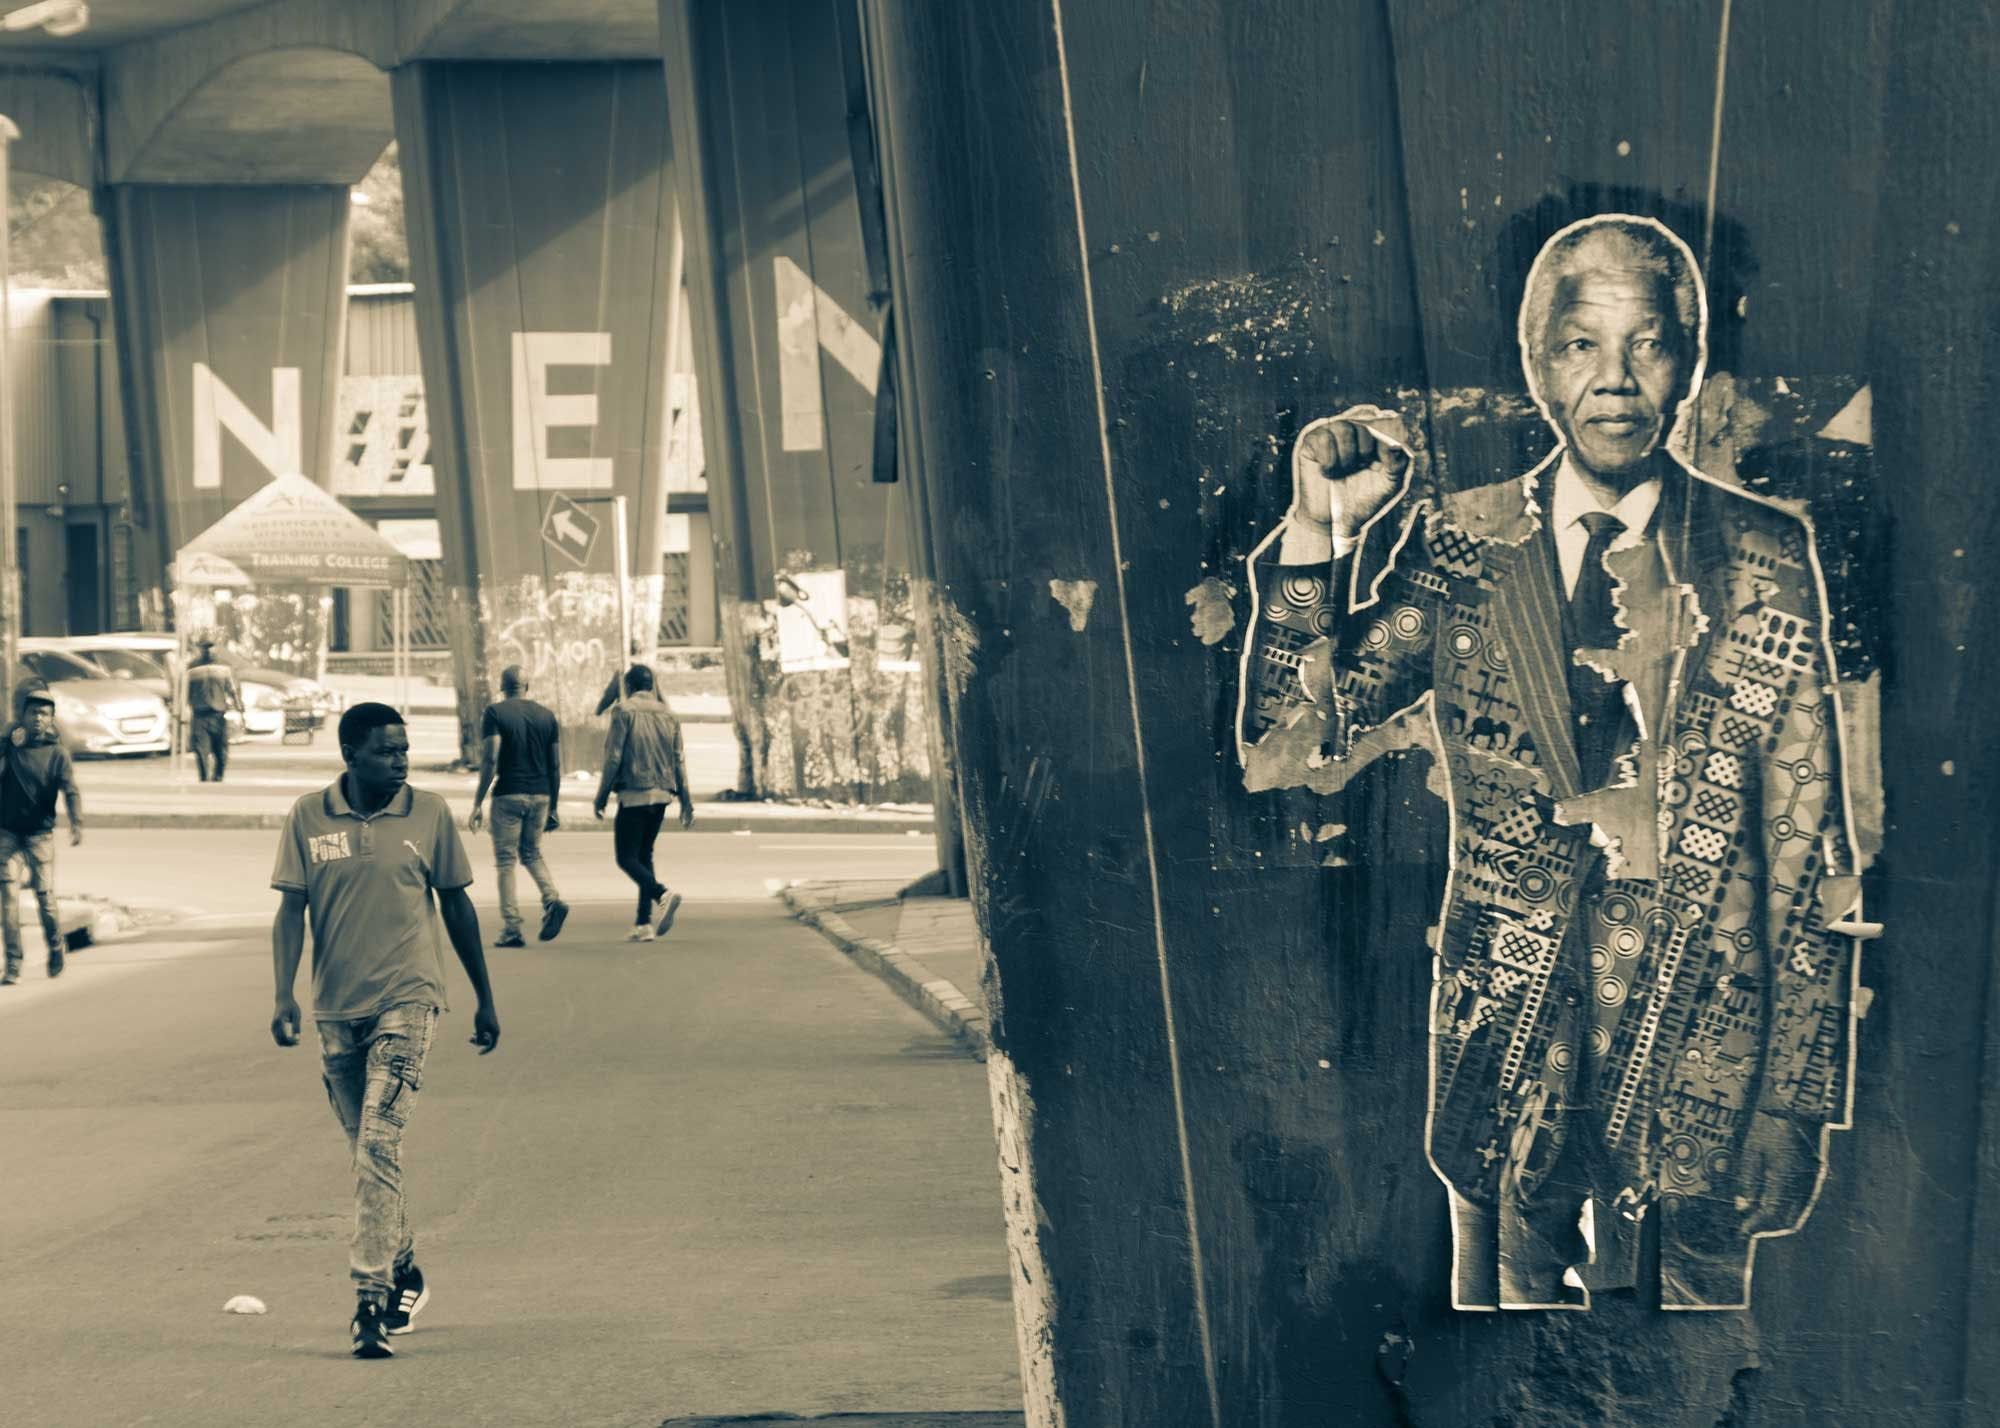 A street art sign of Nelson Mandela